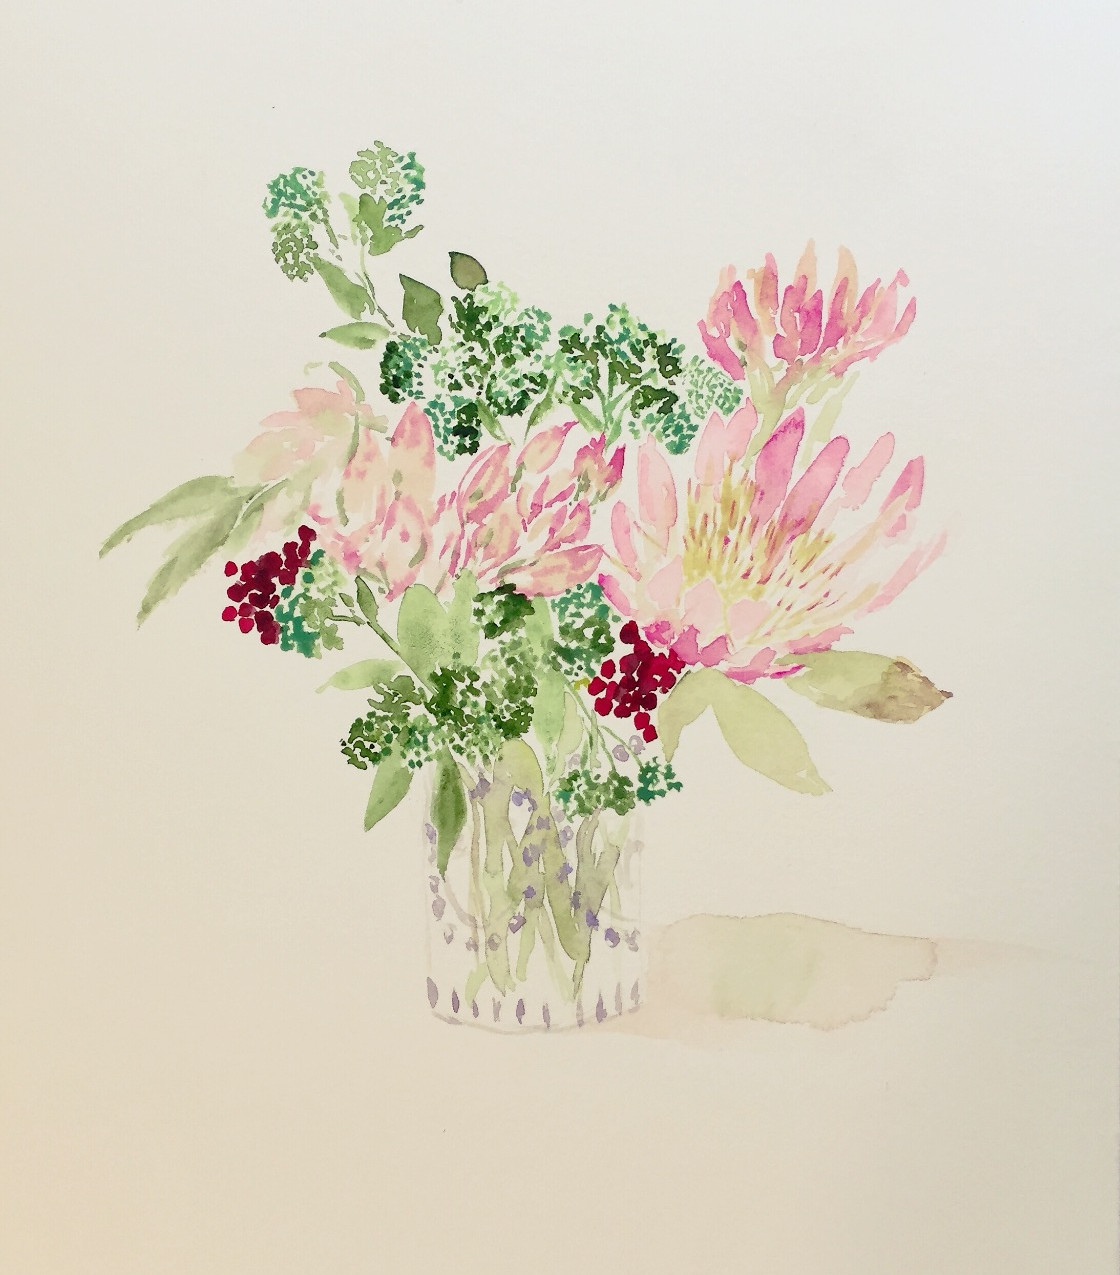 Flowers, Protea and Sedum_edited